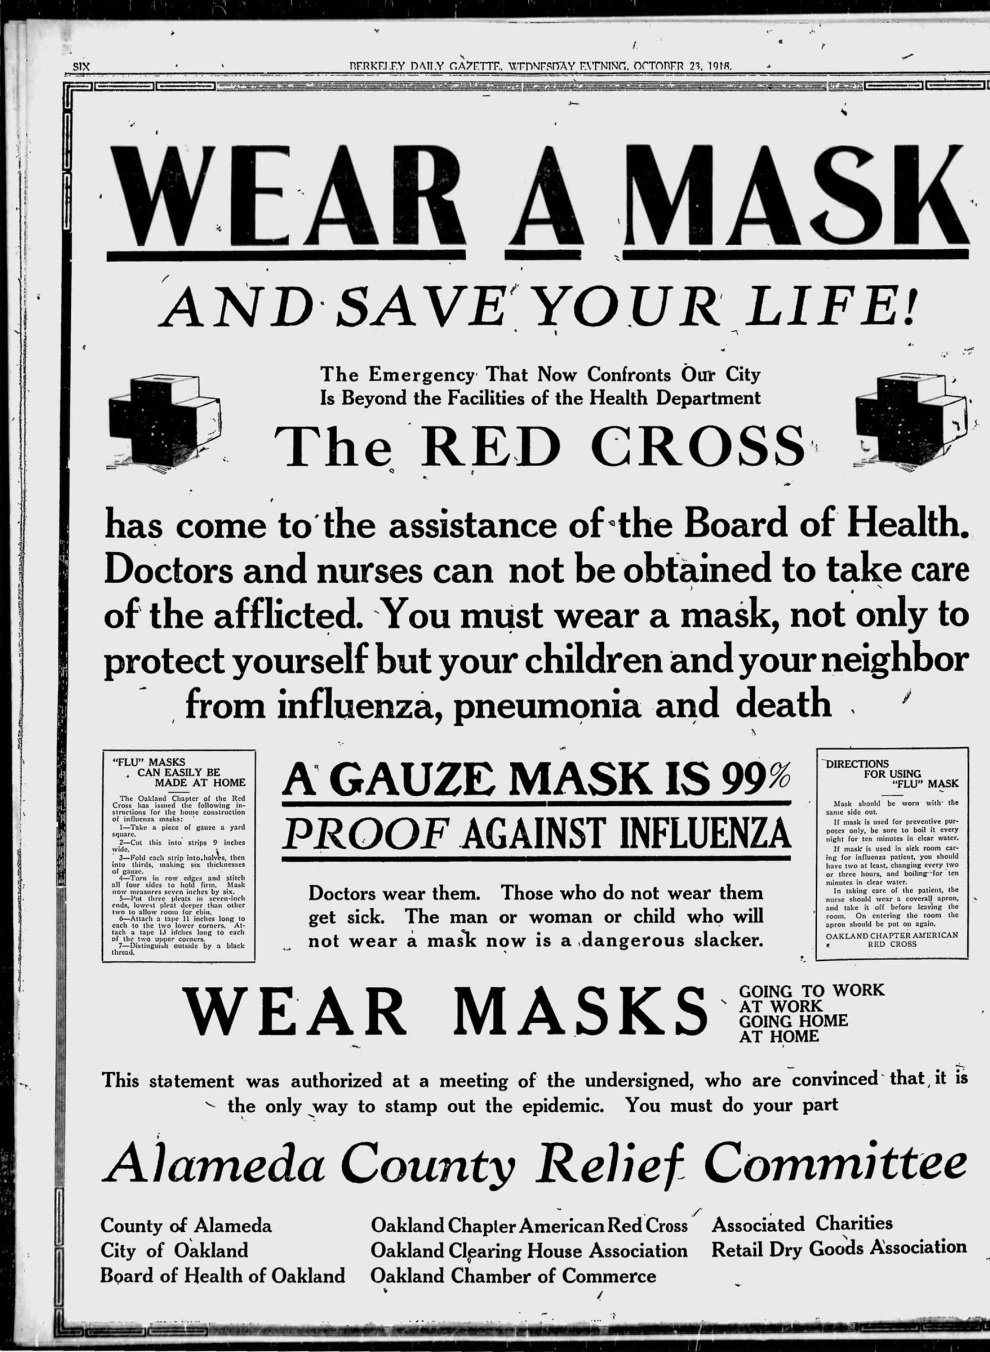 spanish-flu-ads-007.jpg?resize=990,1352